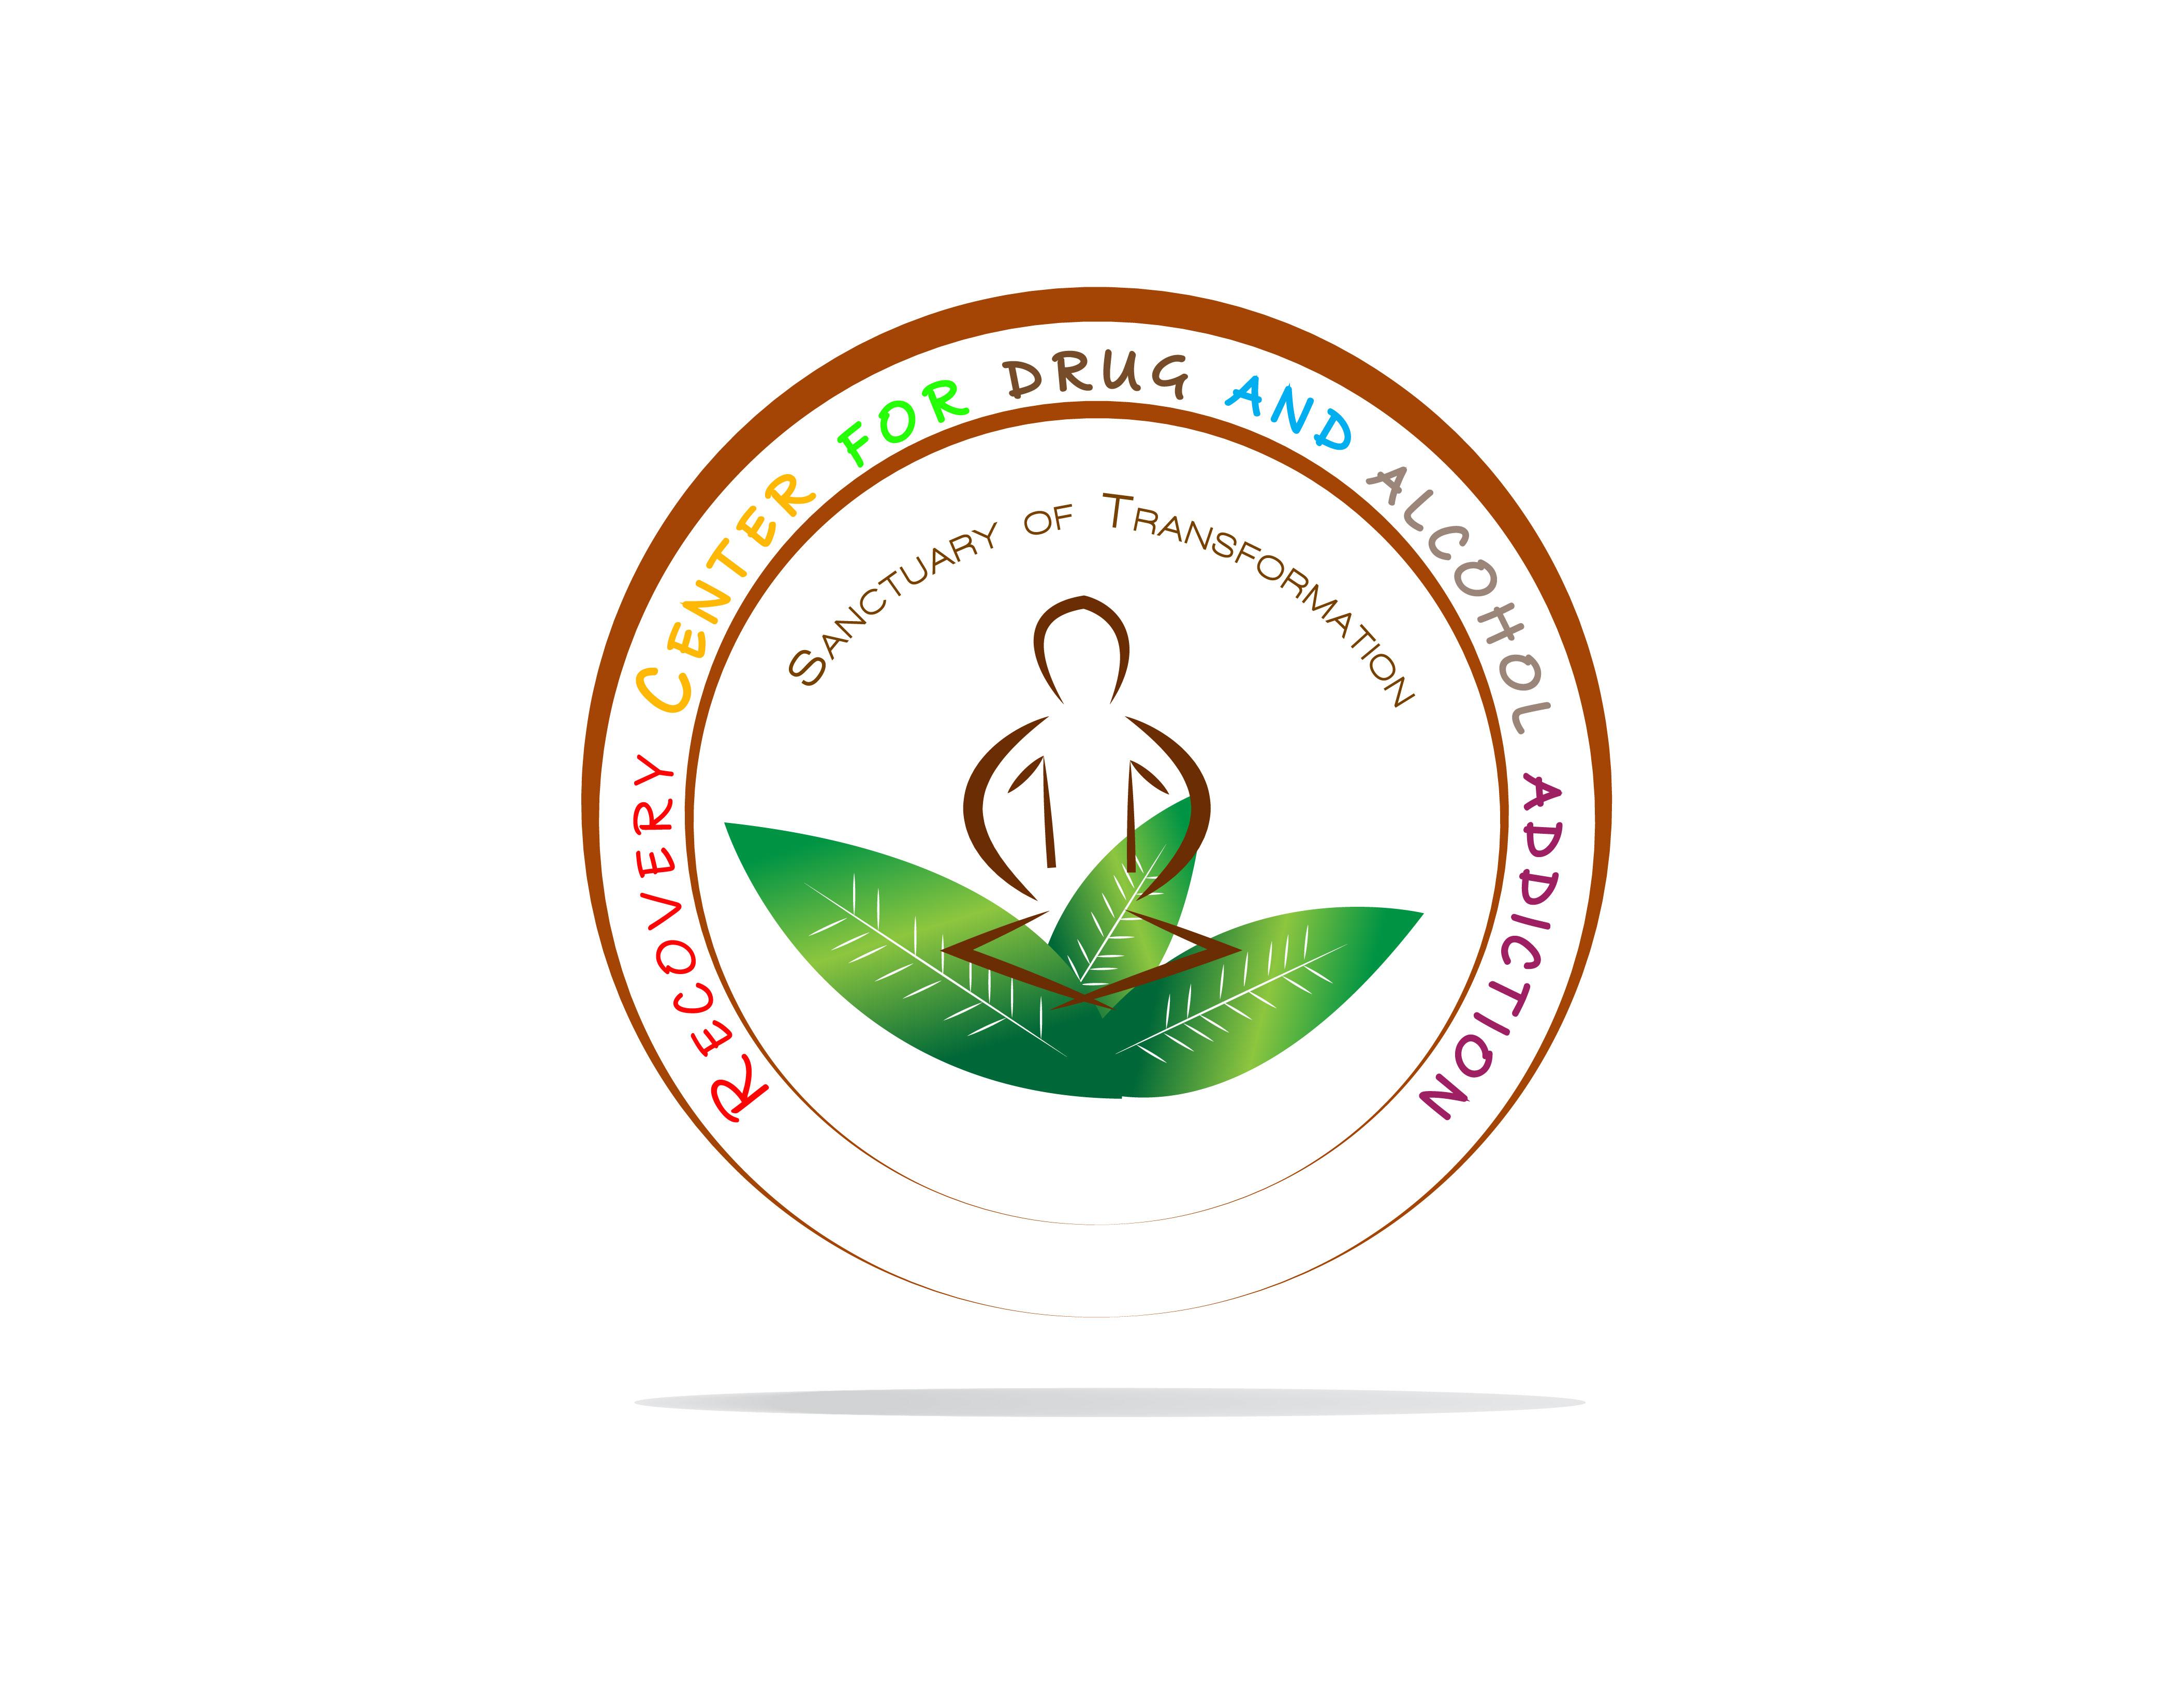 Logo Design by Bilal Baloch - Entry No. 51 in the Logo Design Contest Fun Logo Design for Sanctuary of Transformation.